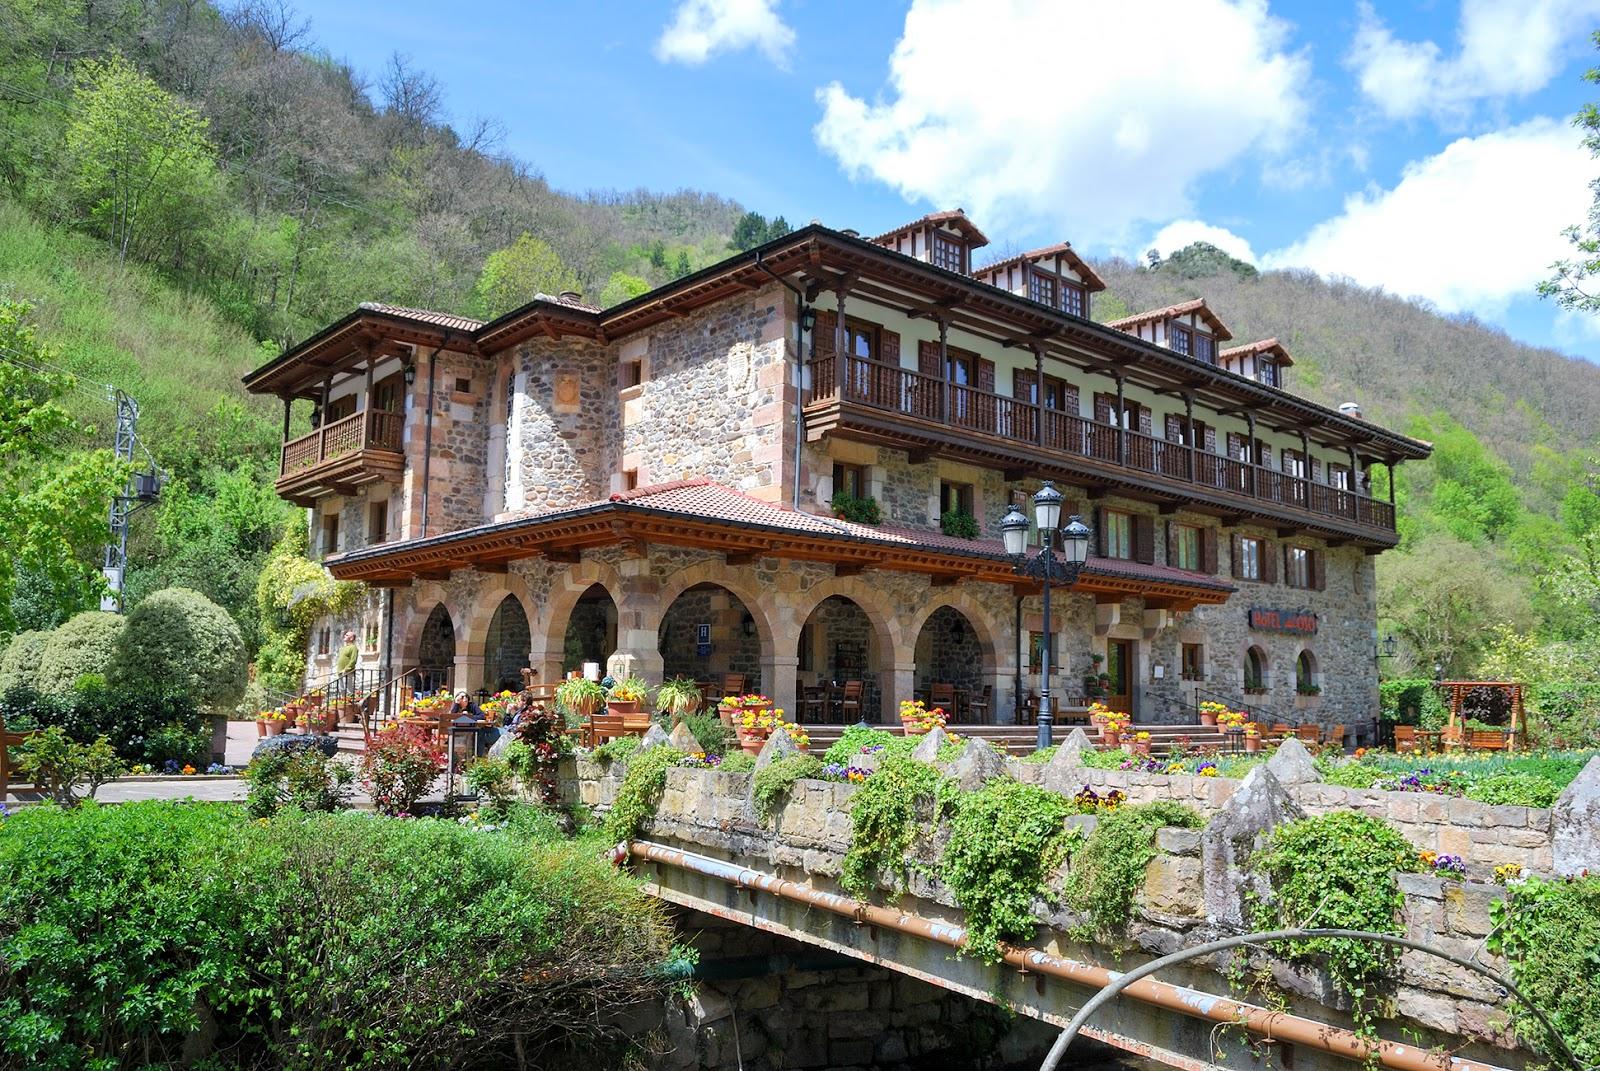 hotel del oso cosgaya cantabria spain flores flowers restaurante